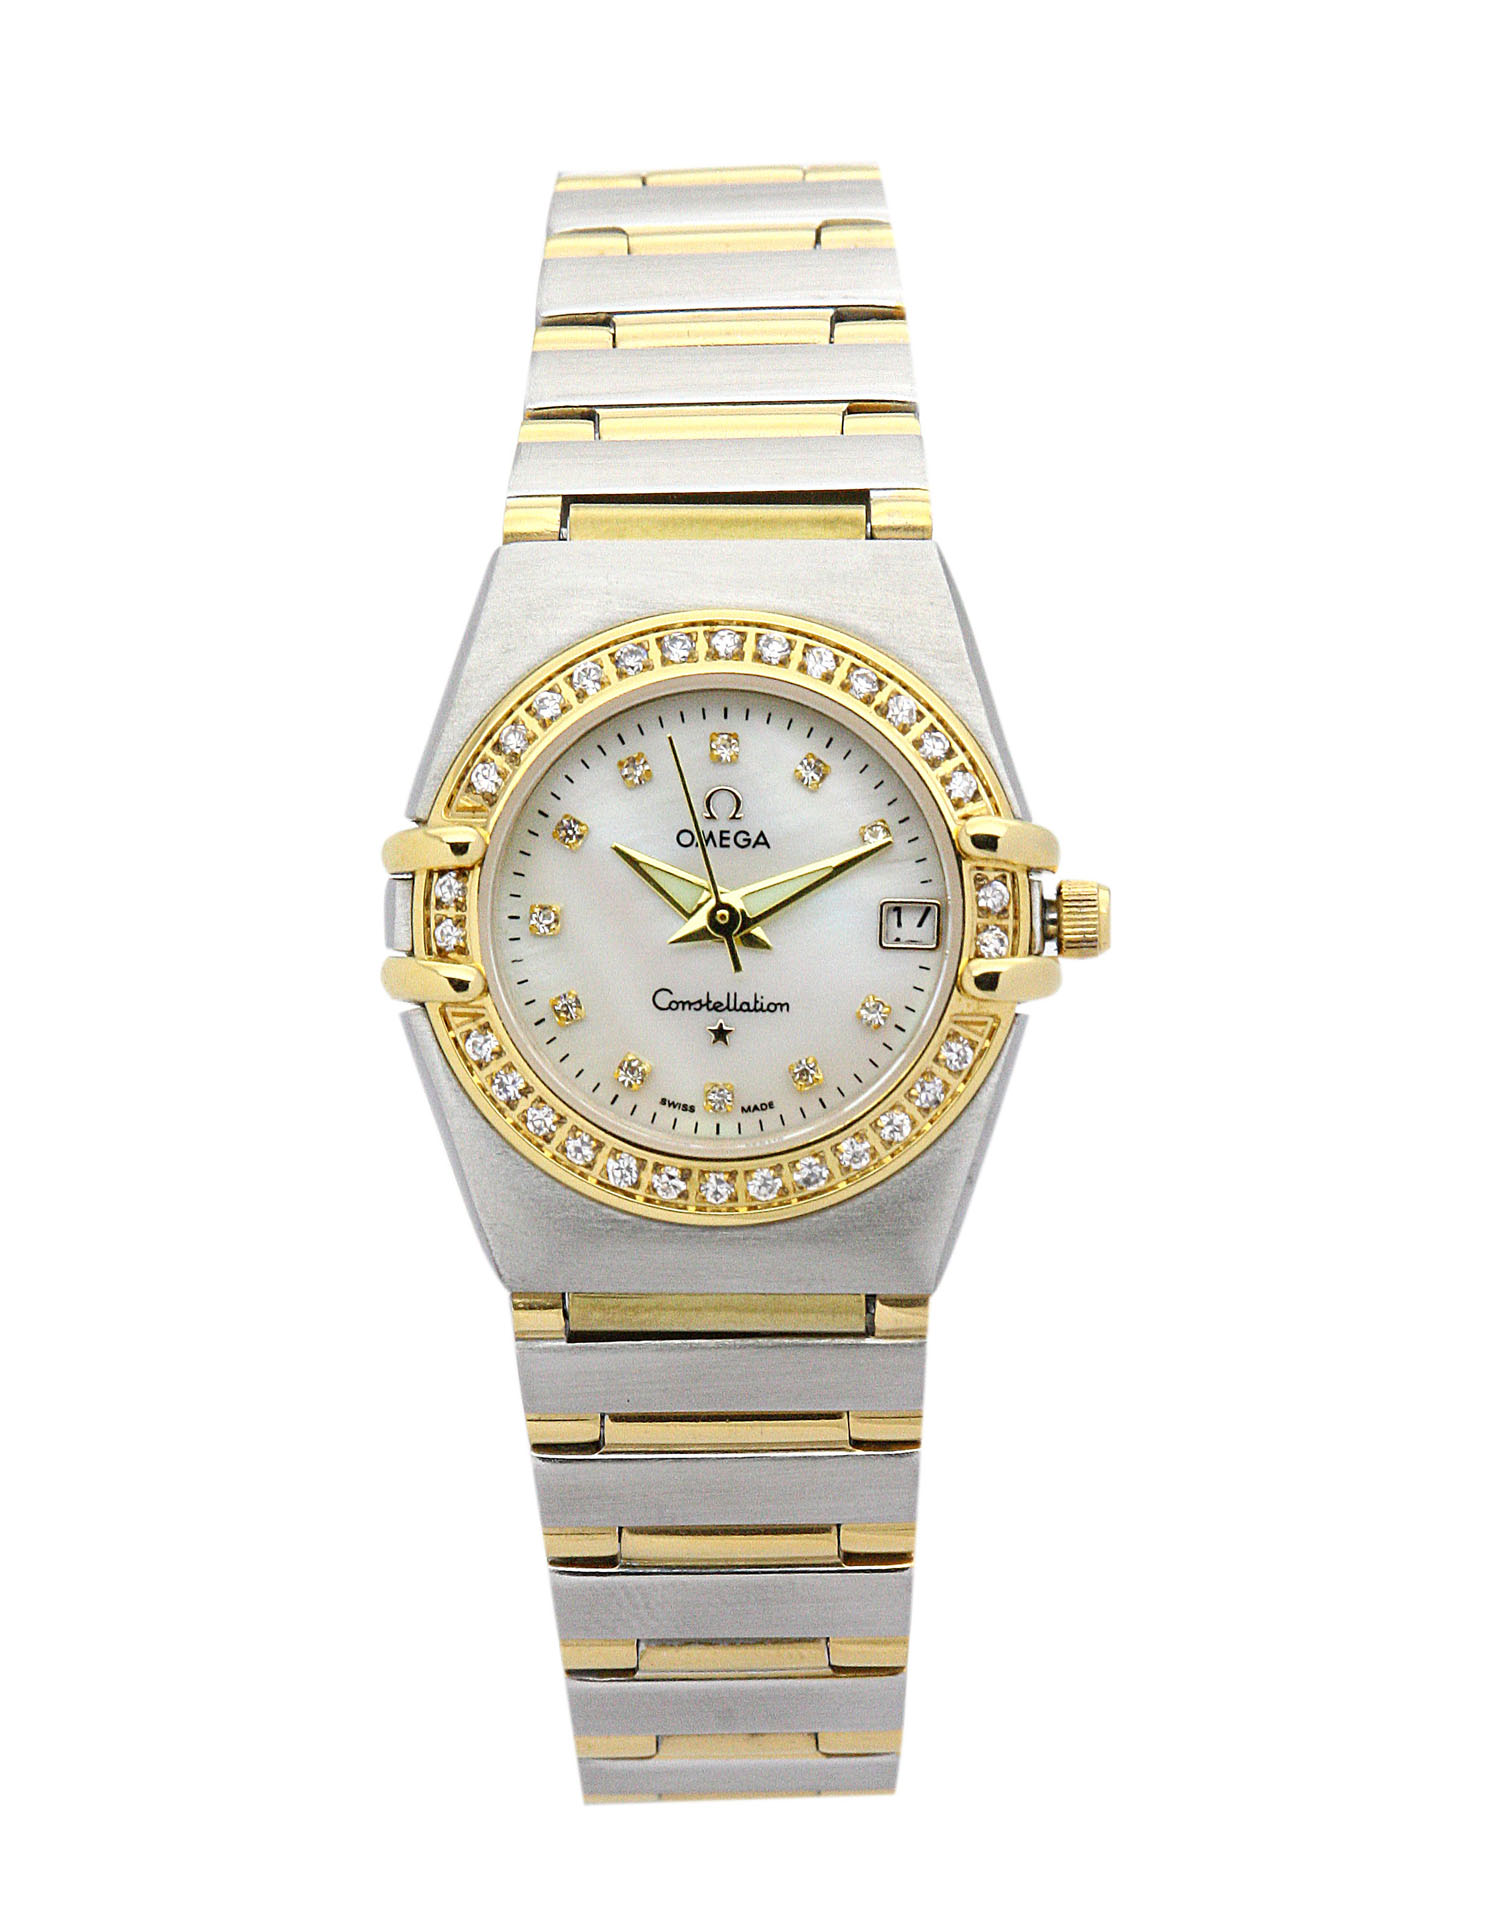 Omega My Choice Mini 1365.75.00 Ladies 22.5 Mm Steel & Yellow Gold Set With Diamonds Case Quartz Movement – iapac.to